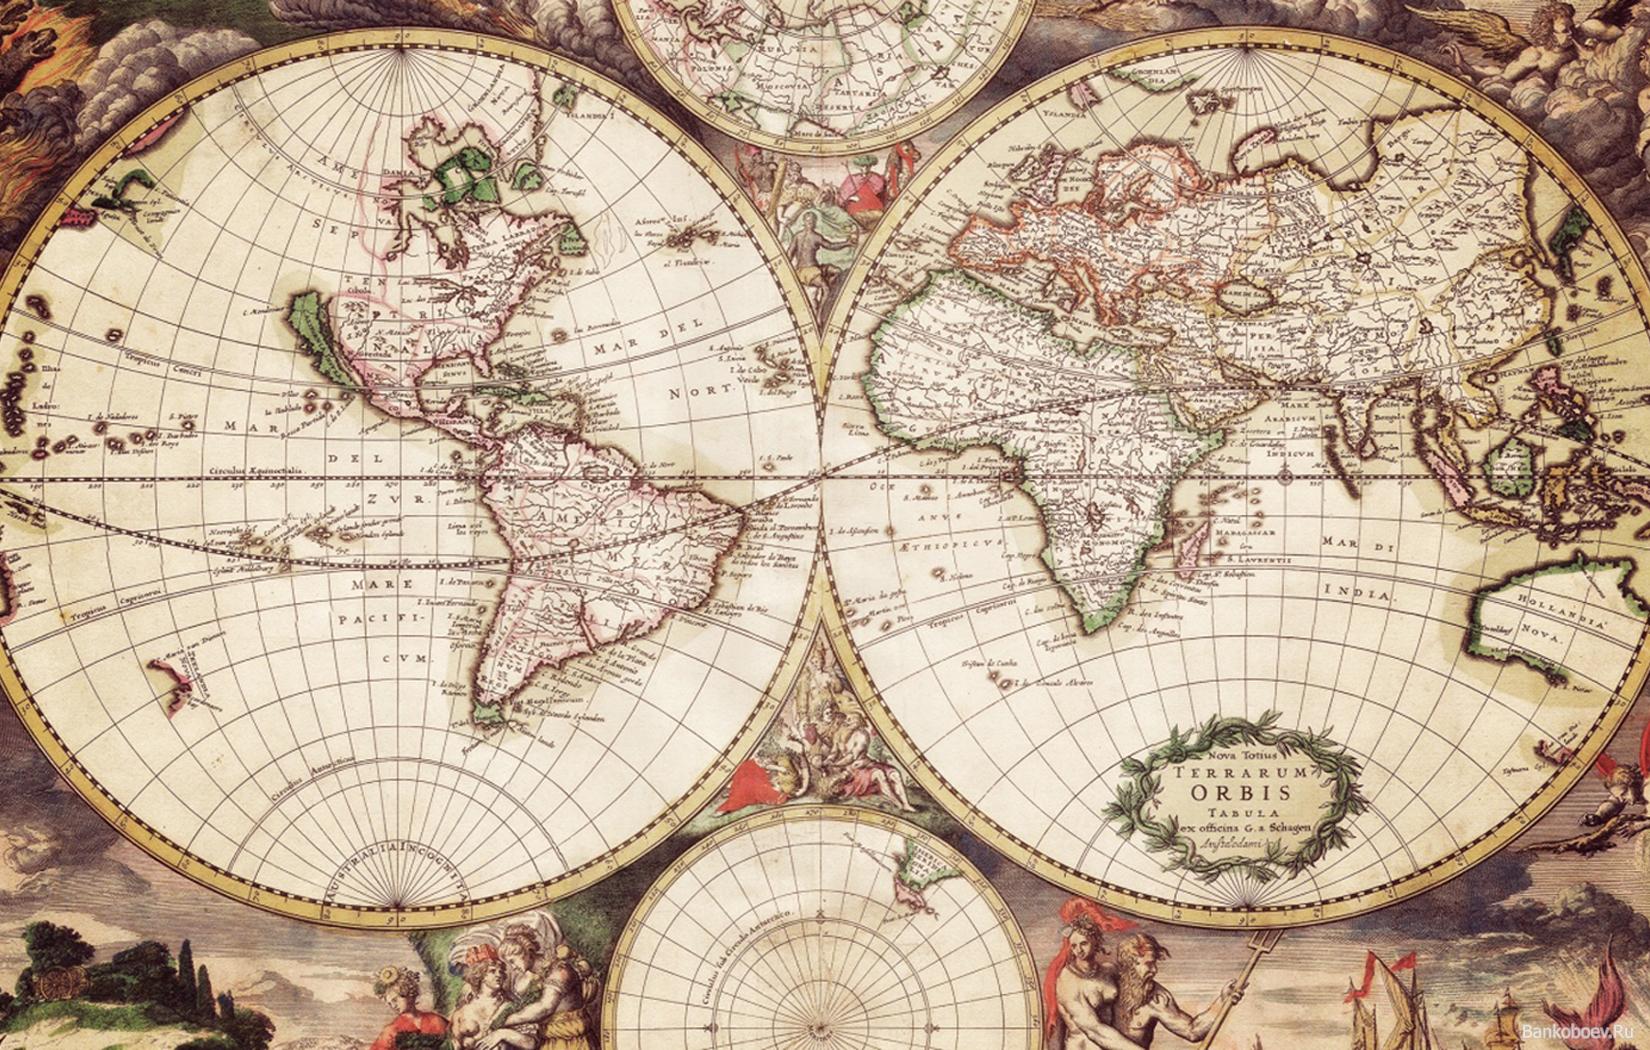 Alcune considerazioni su geografia sacra e geopolitica – Daniele Perra